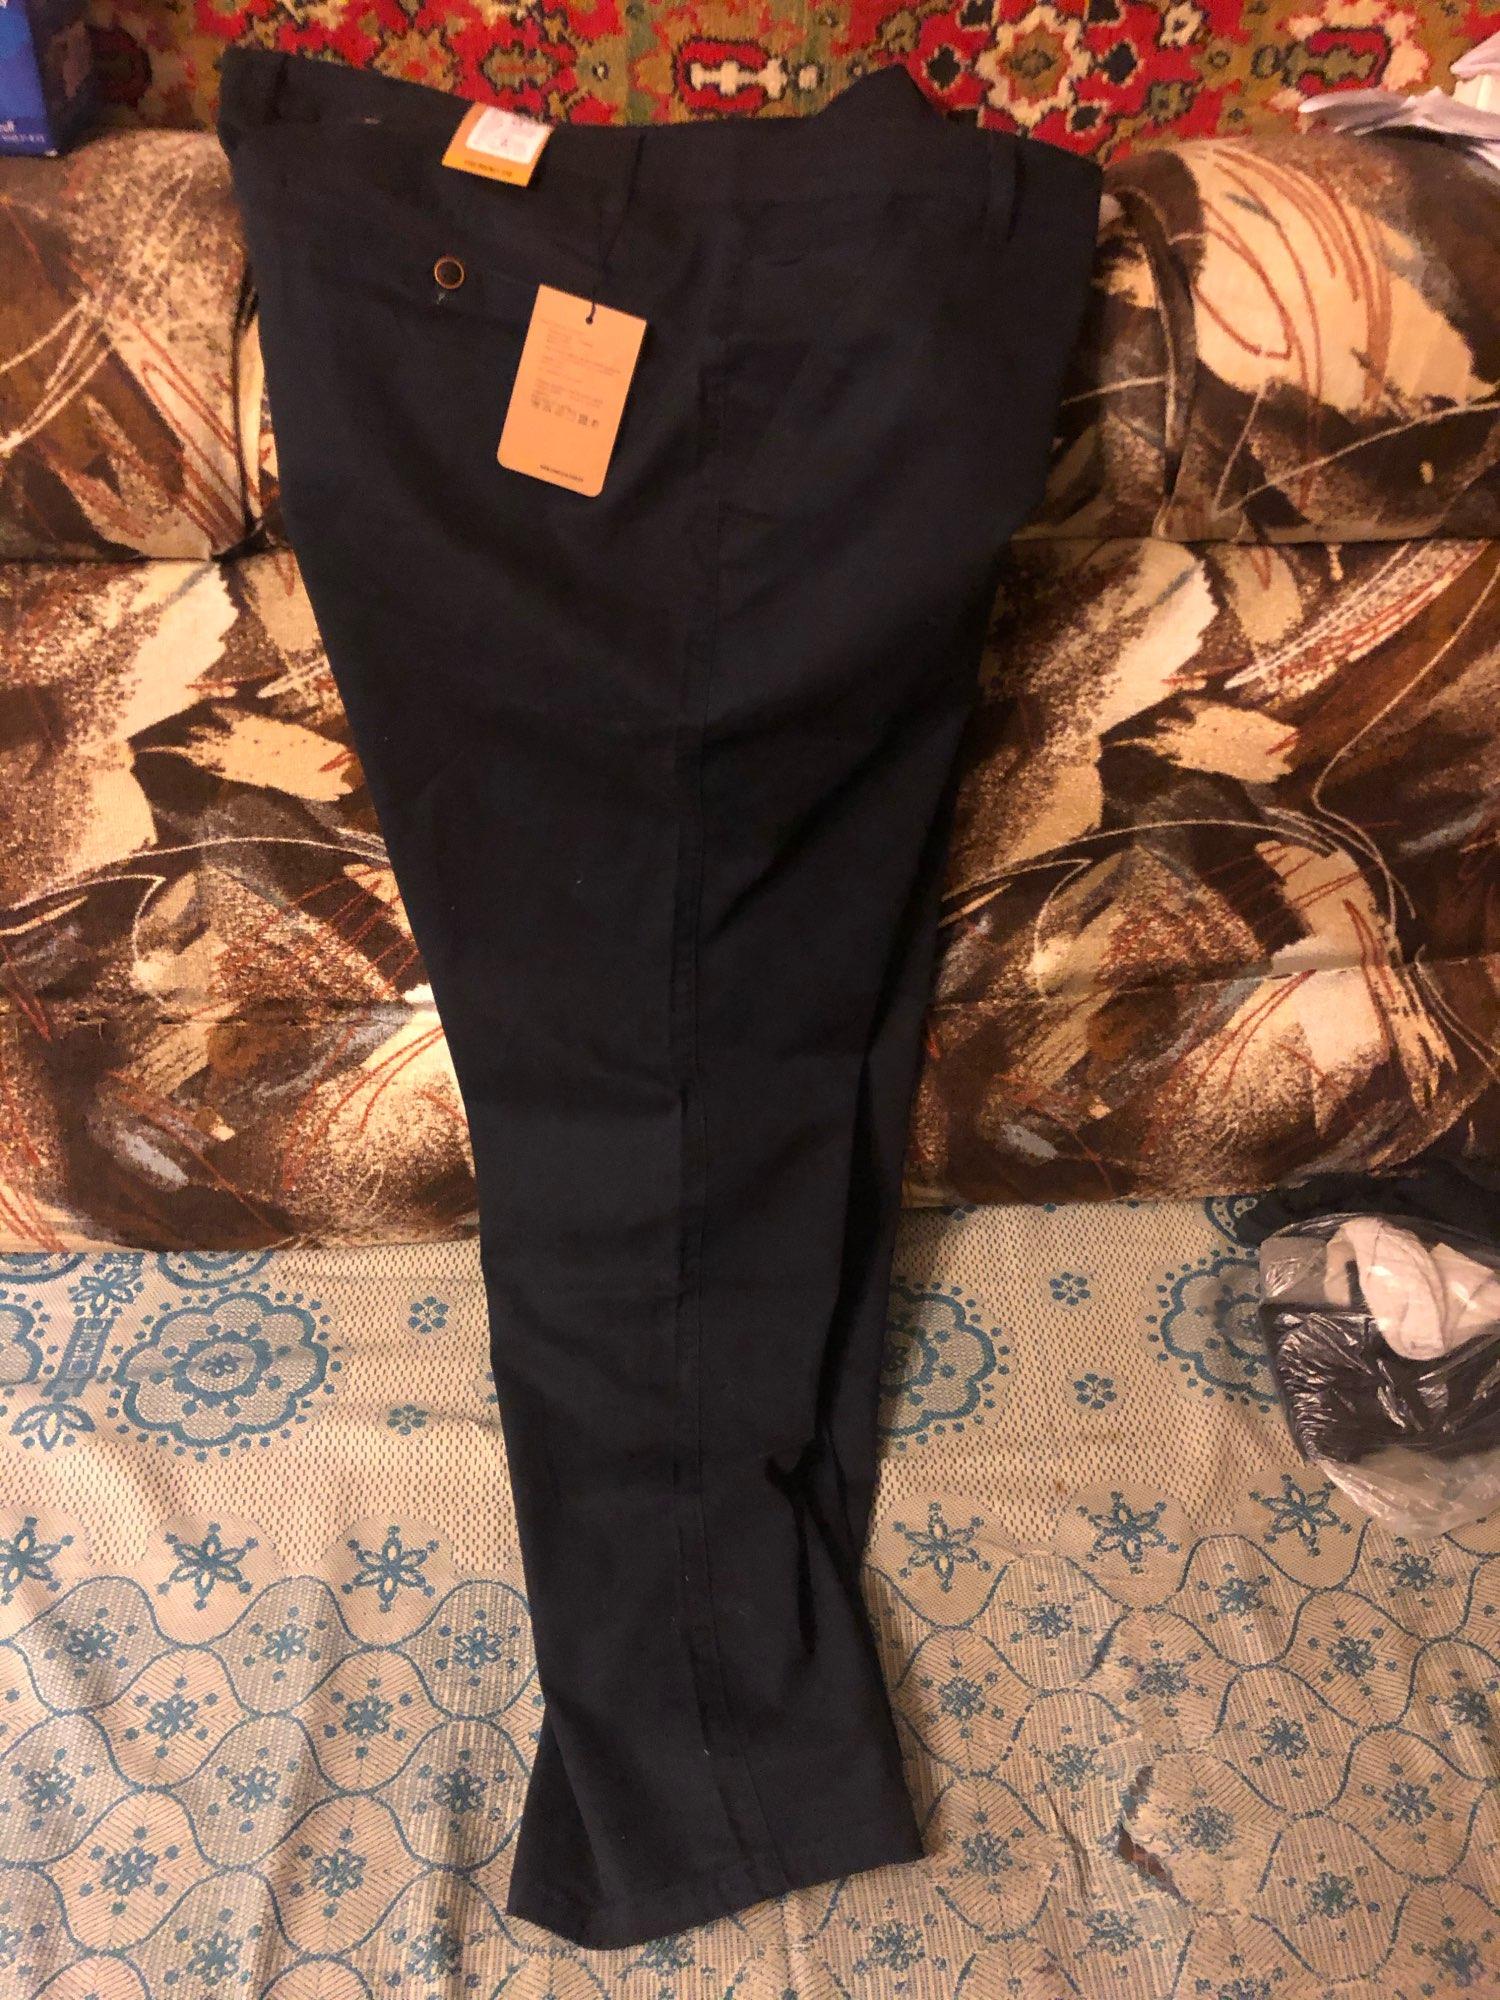 VOMINT Mens Pants Cotton Casual  Stretch male trousers man long Straight High Quality 4 color Plus size pant suit  42 44 46|pants black|business pantsbusiness trousers - AliExpress